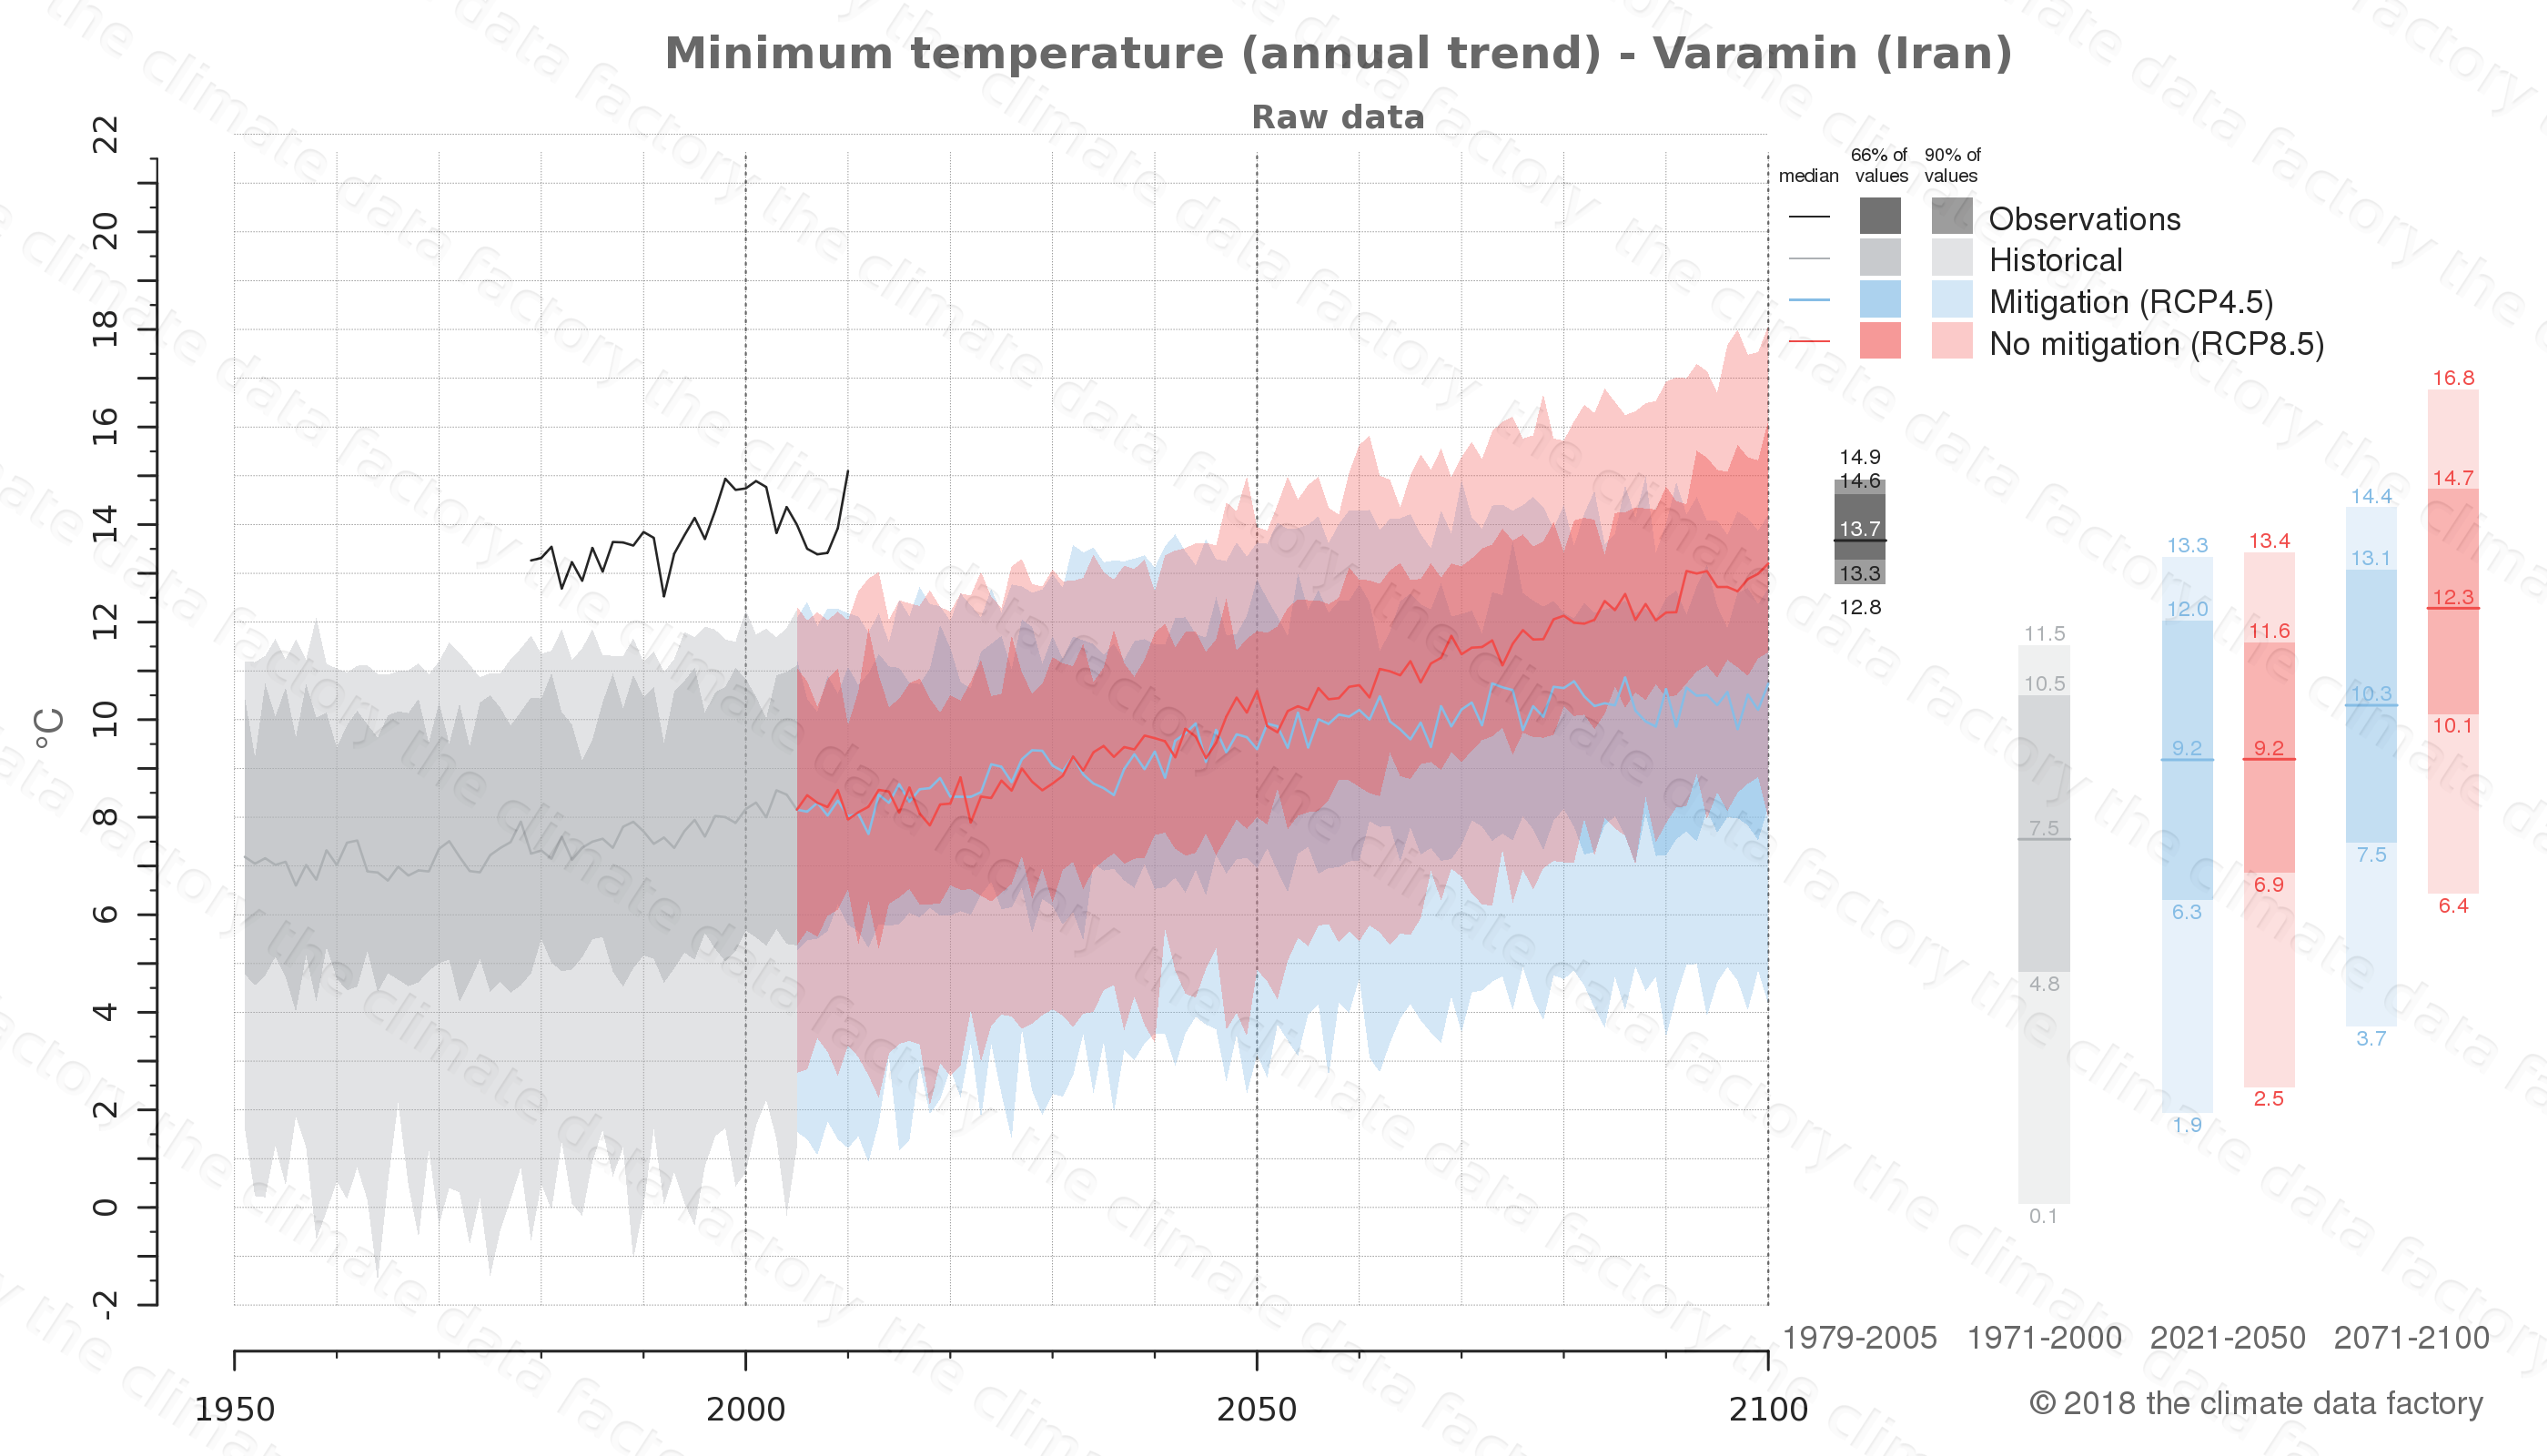 climate change data policy adaptation climate graph city data minimum-temperature varamin iran